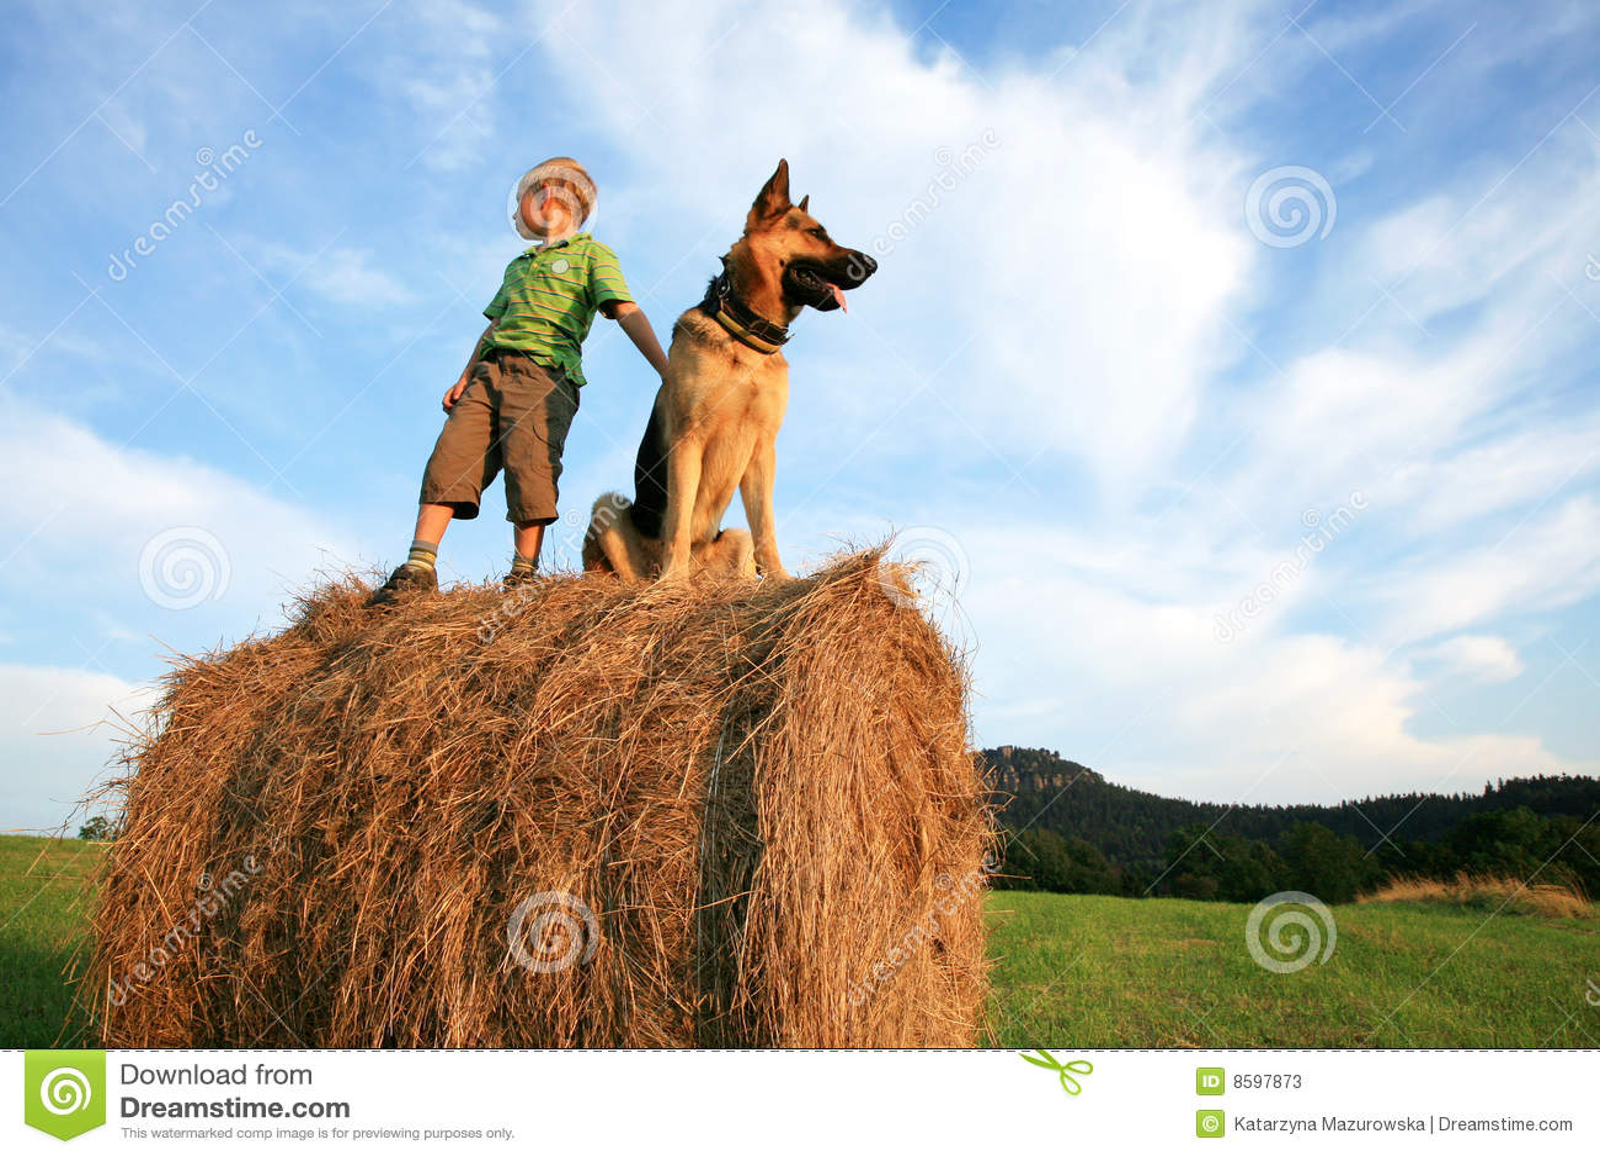 Little Boy Big Dog Stock Images